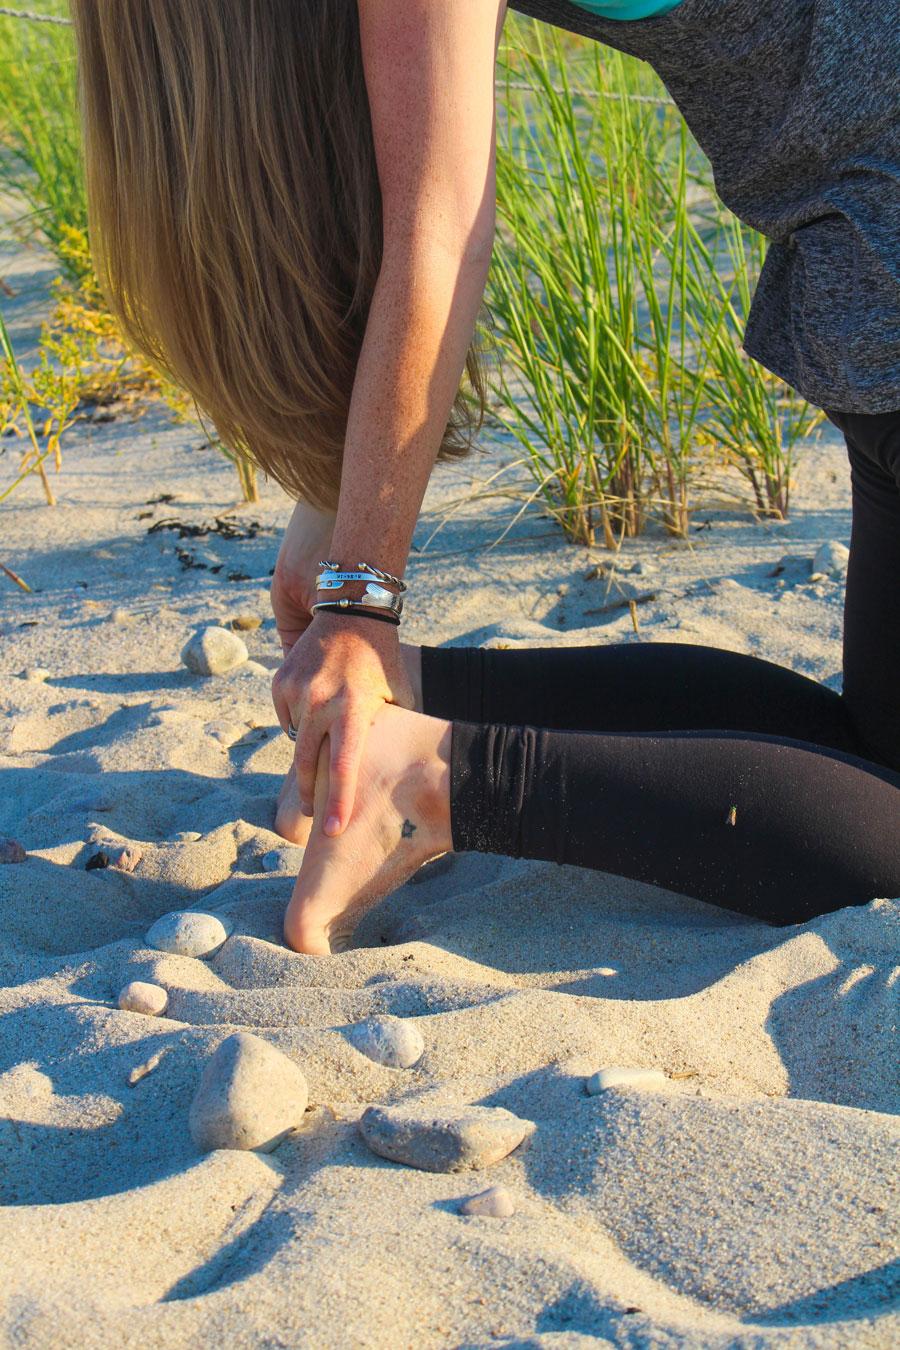 Olivia_Beaton_Photographer_Cape_Cod_Yoga_3.jpg